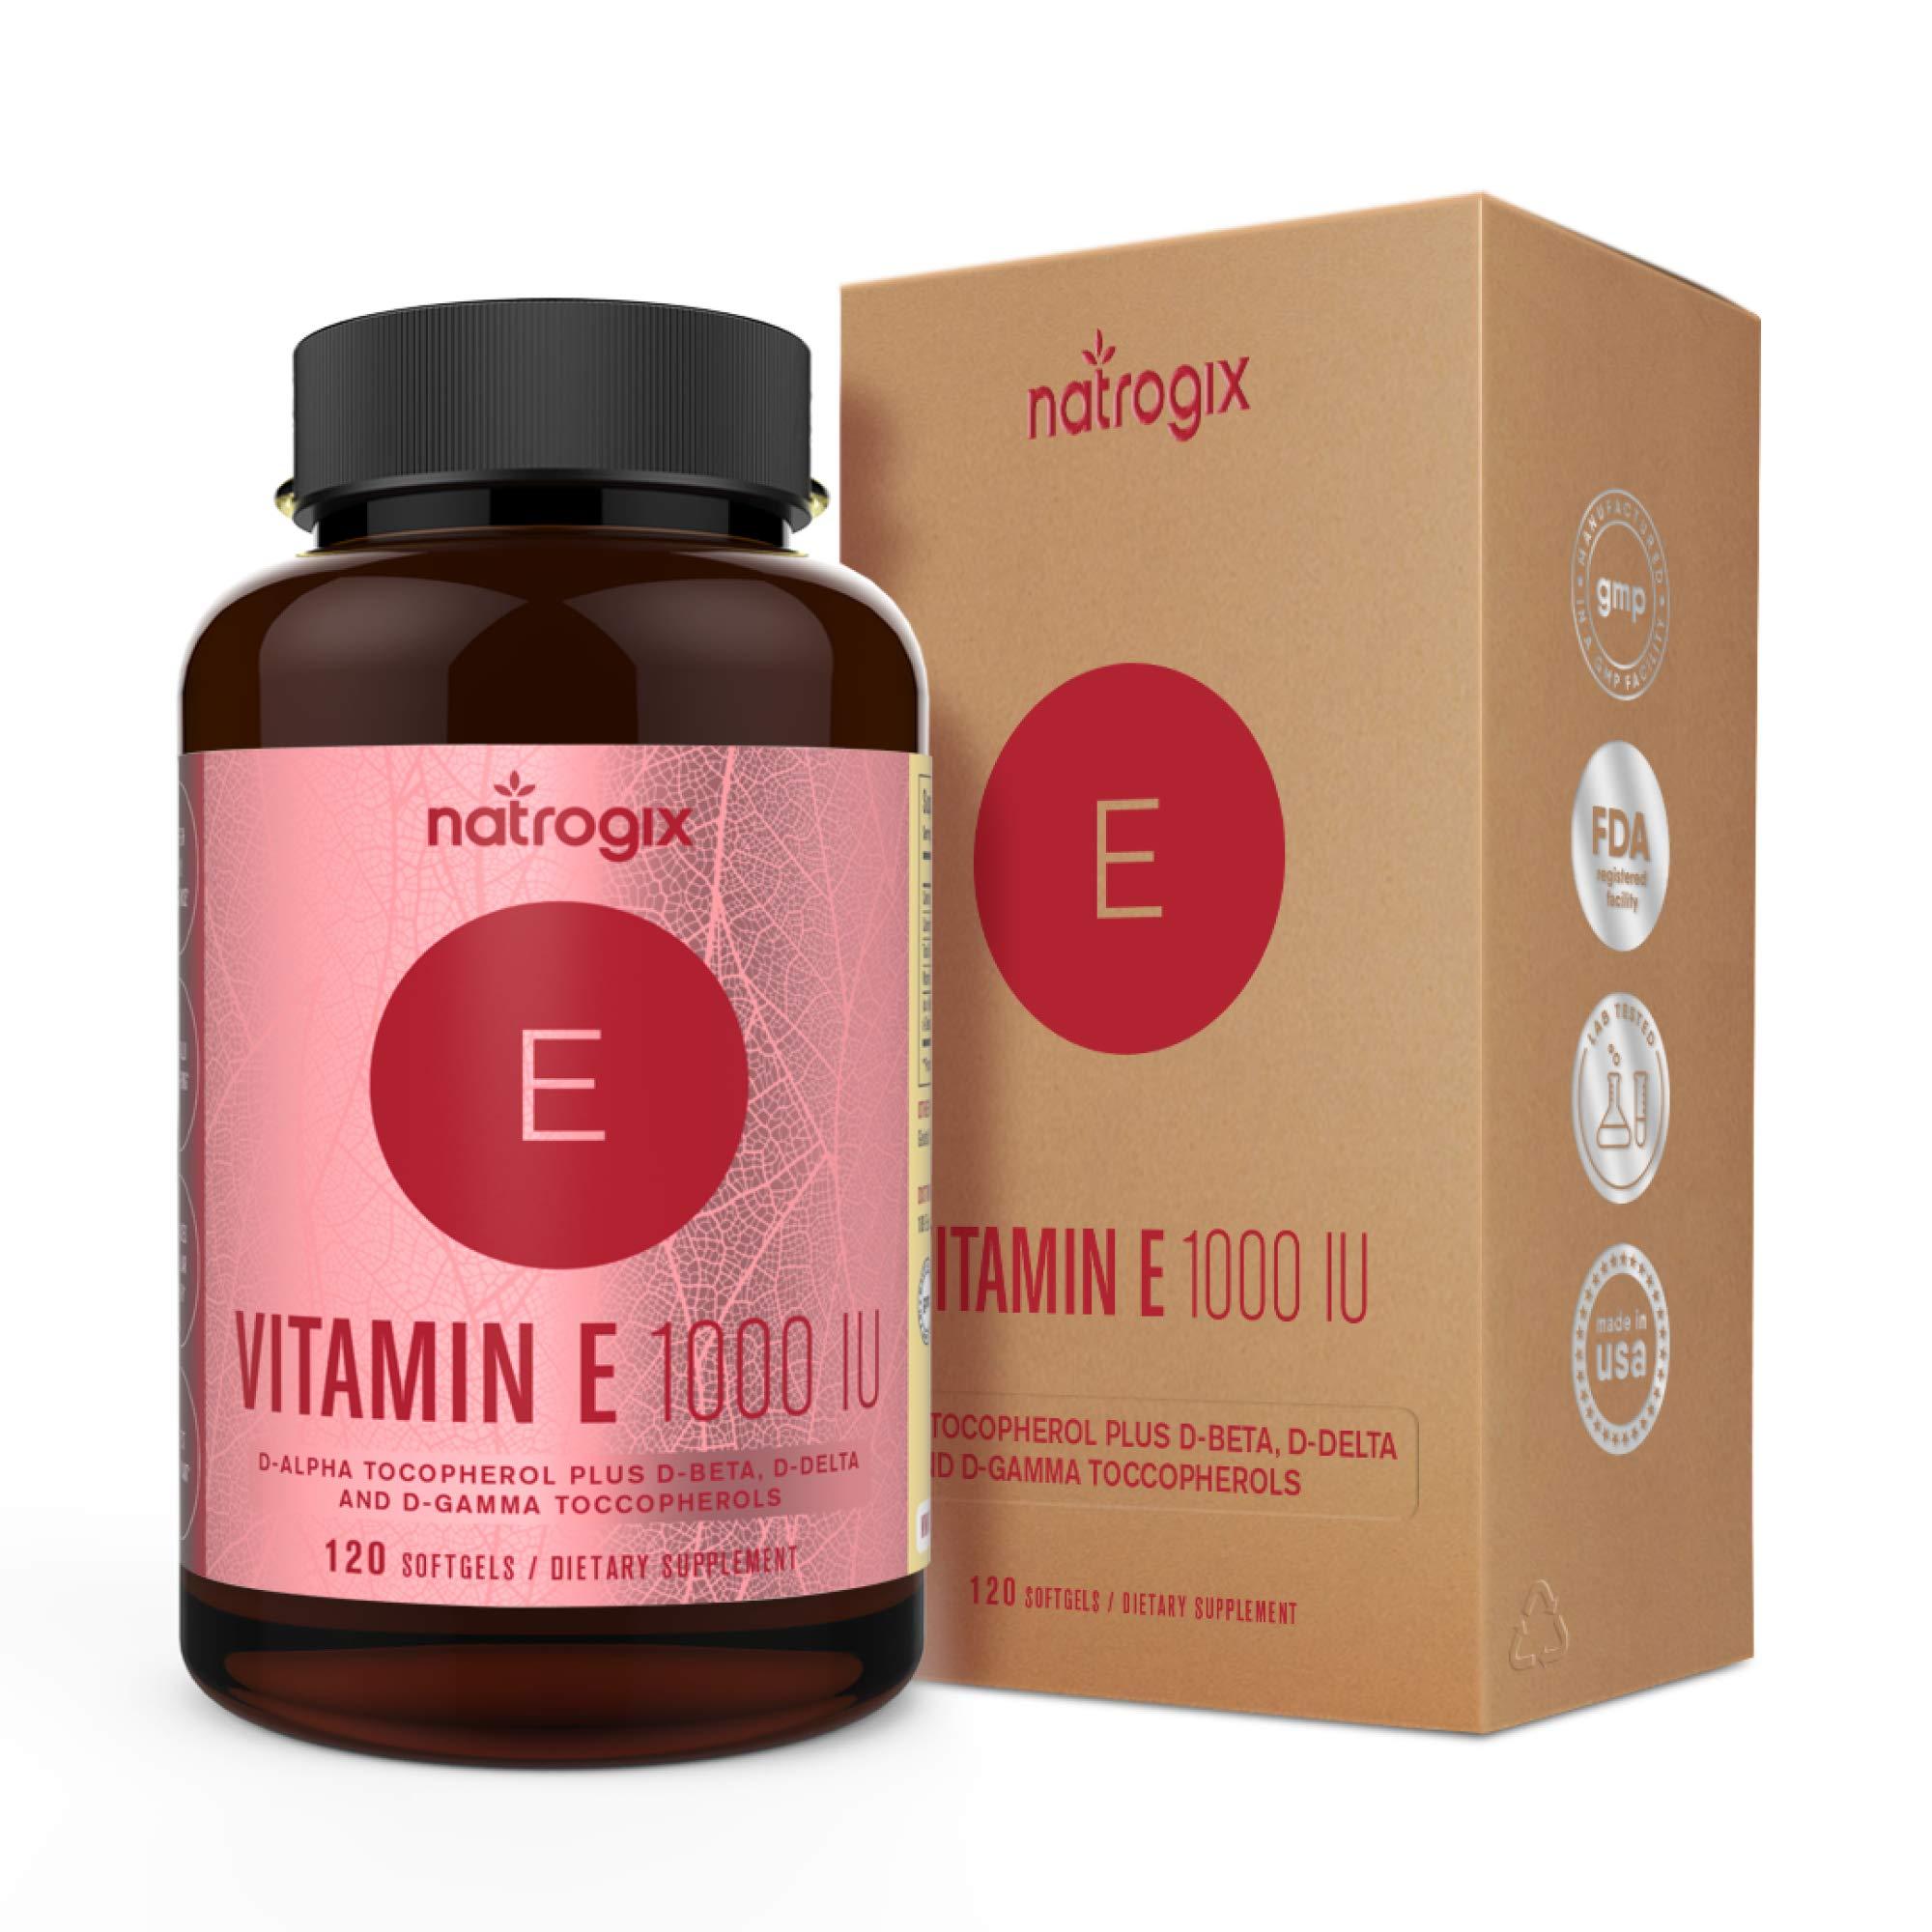 5bf422bdc31 Natural Vitamin E Capsules 1000 IU (120 Softgels) by Natrogix - Mixed D-Alpha  Tocopherol and Mixed Tocopherols - Antioxidant for Healthy Skin